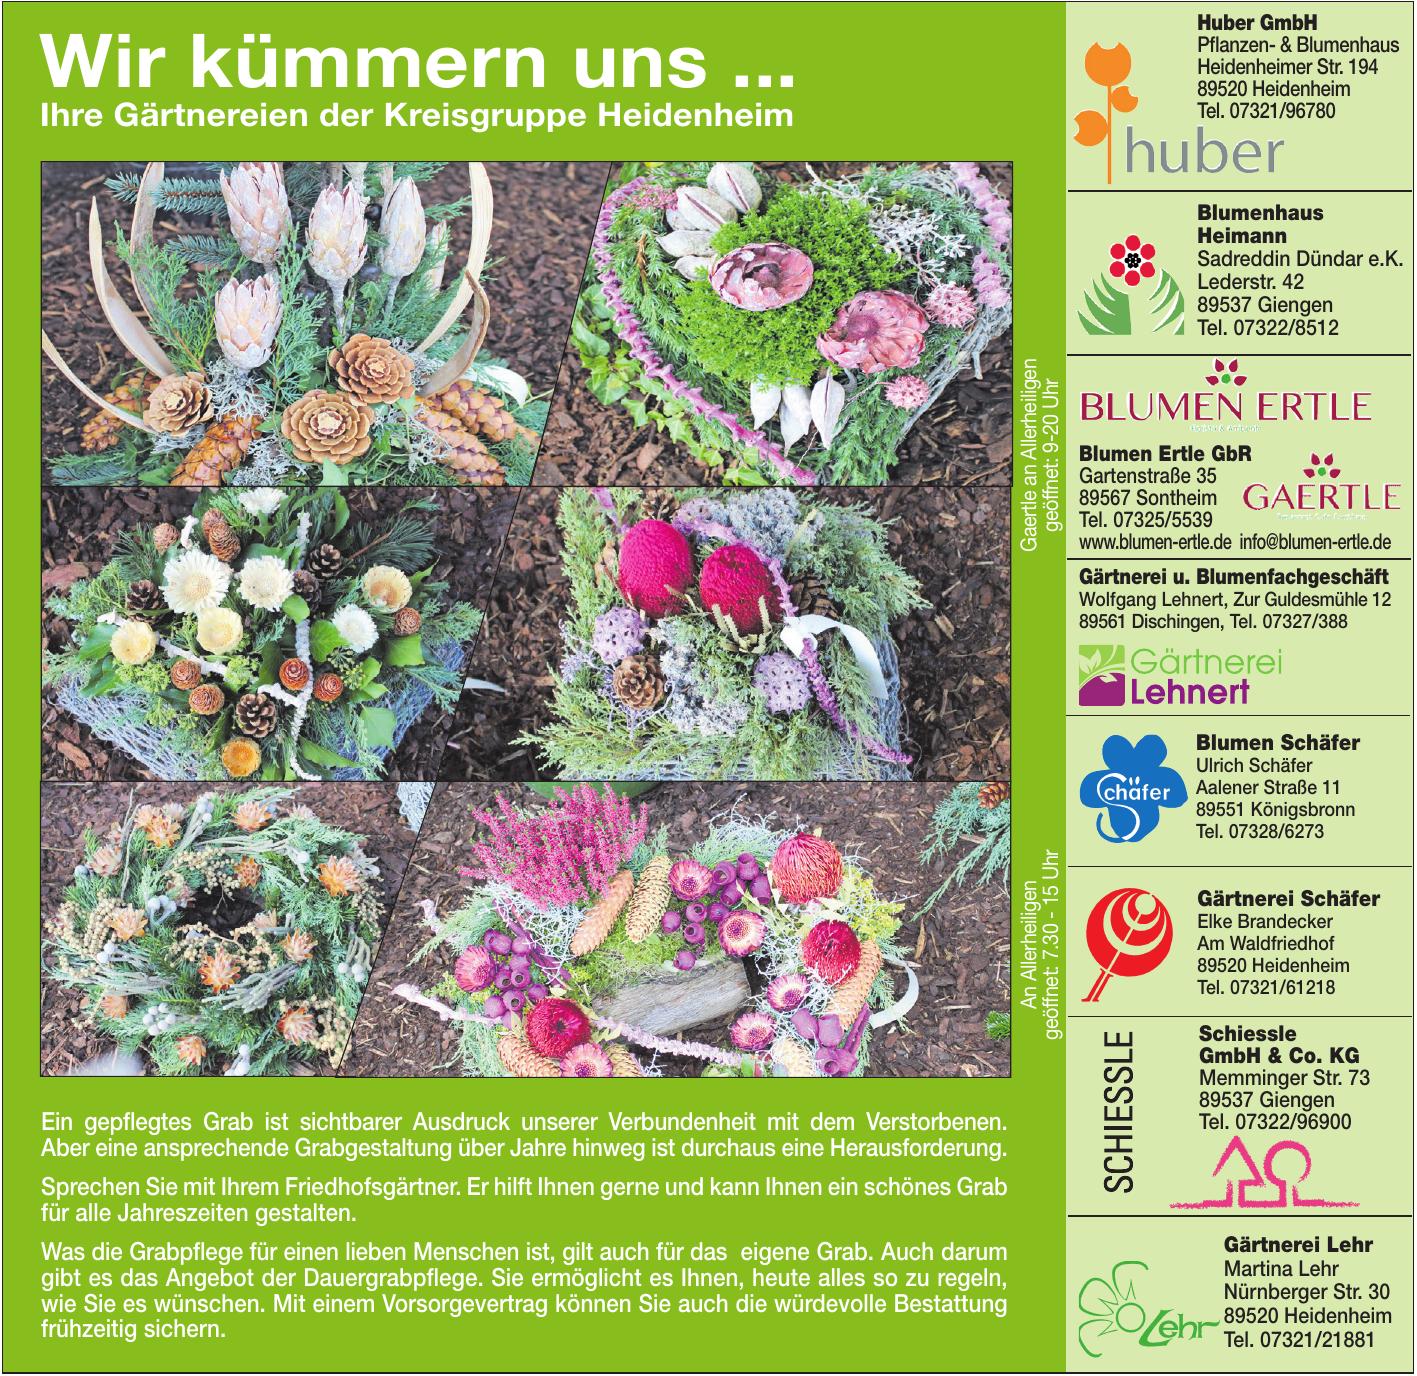 Gärtnereien der Kreisgruppe Heidenheim